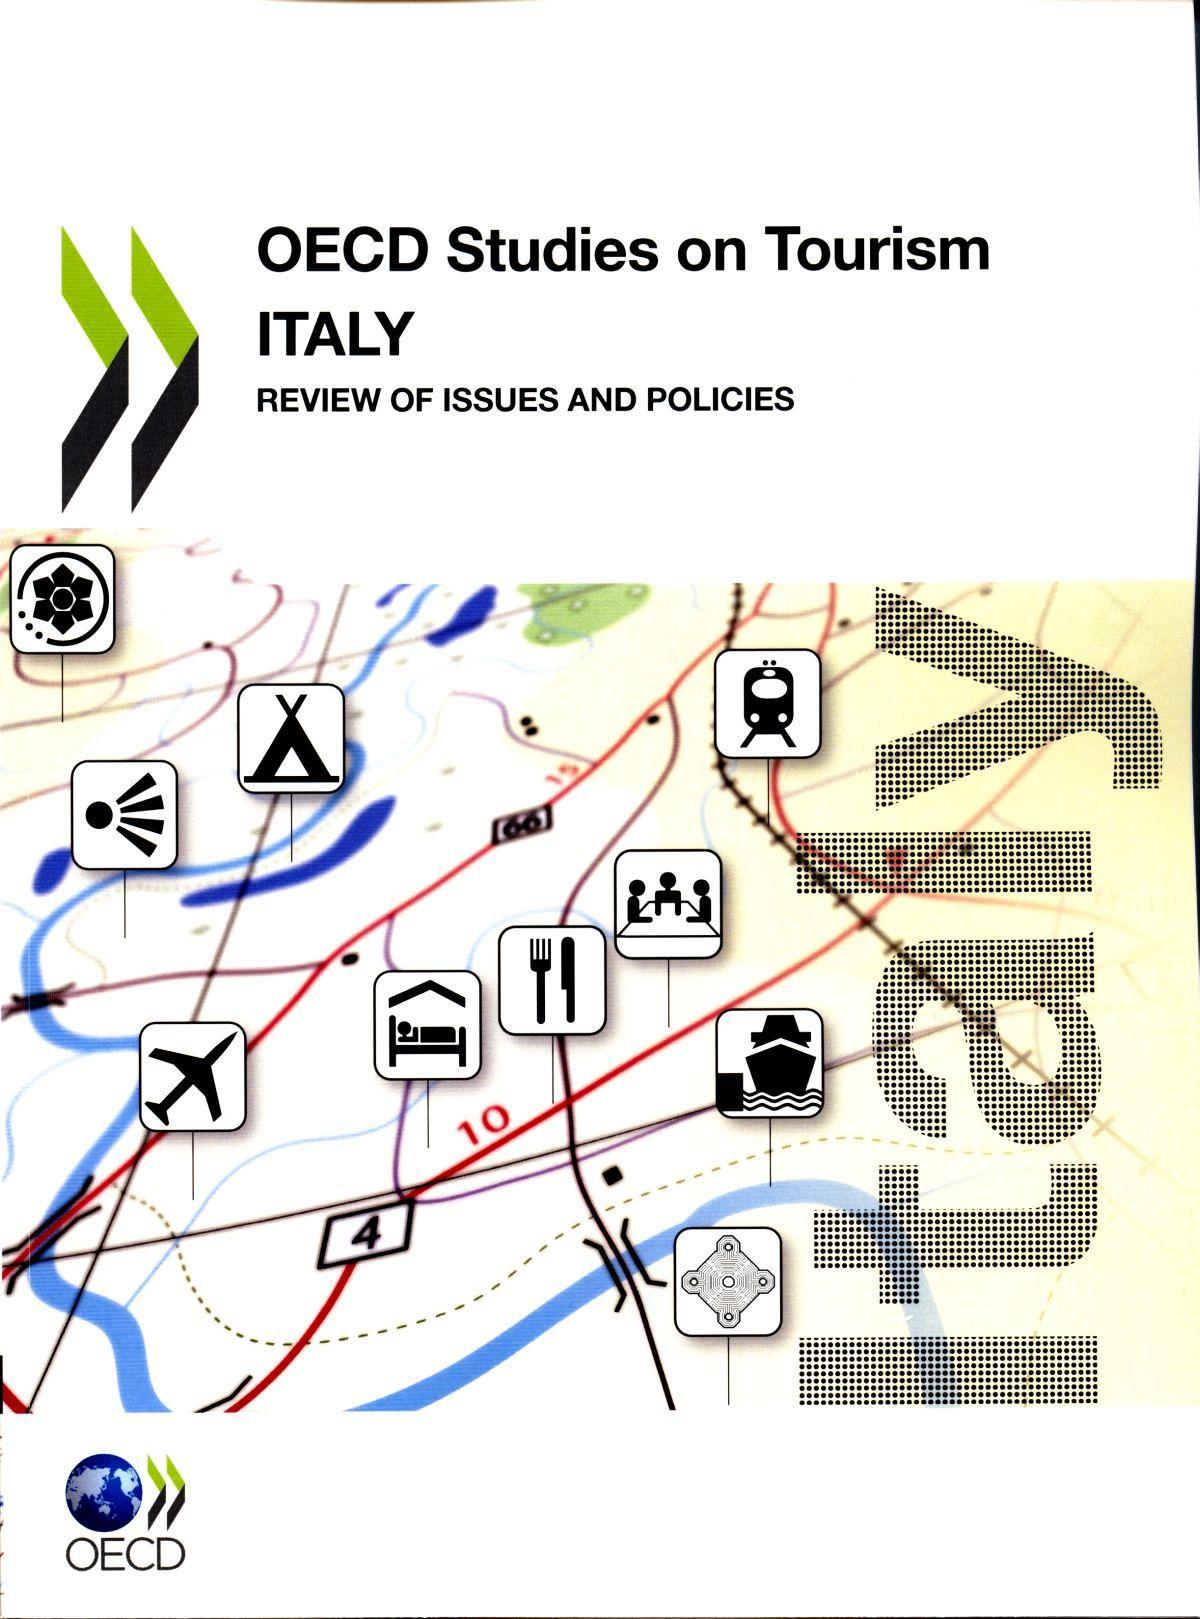 OECD STUDIES ON TOURISM : ITALY